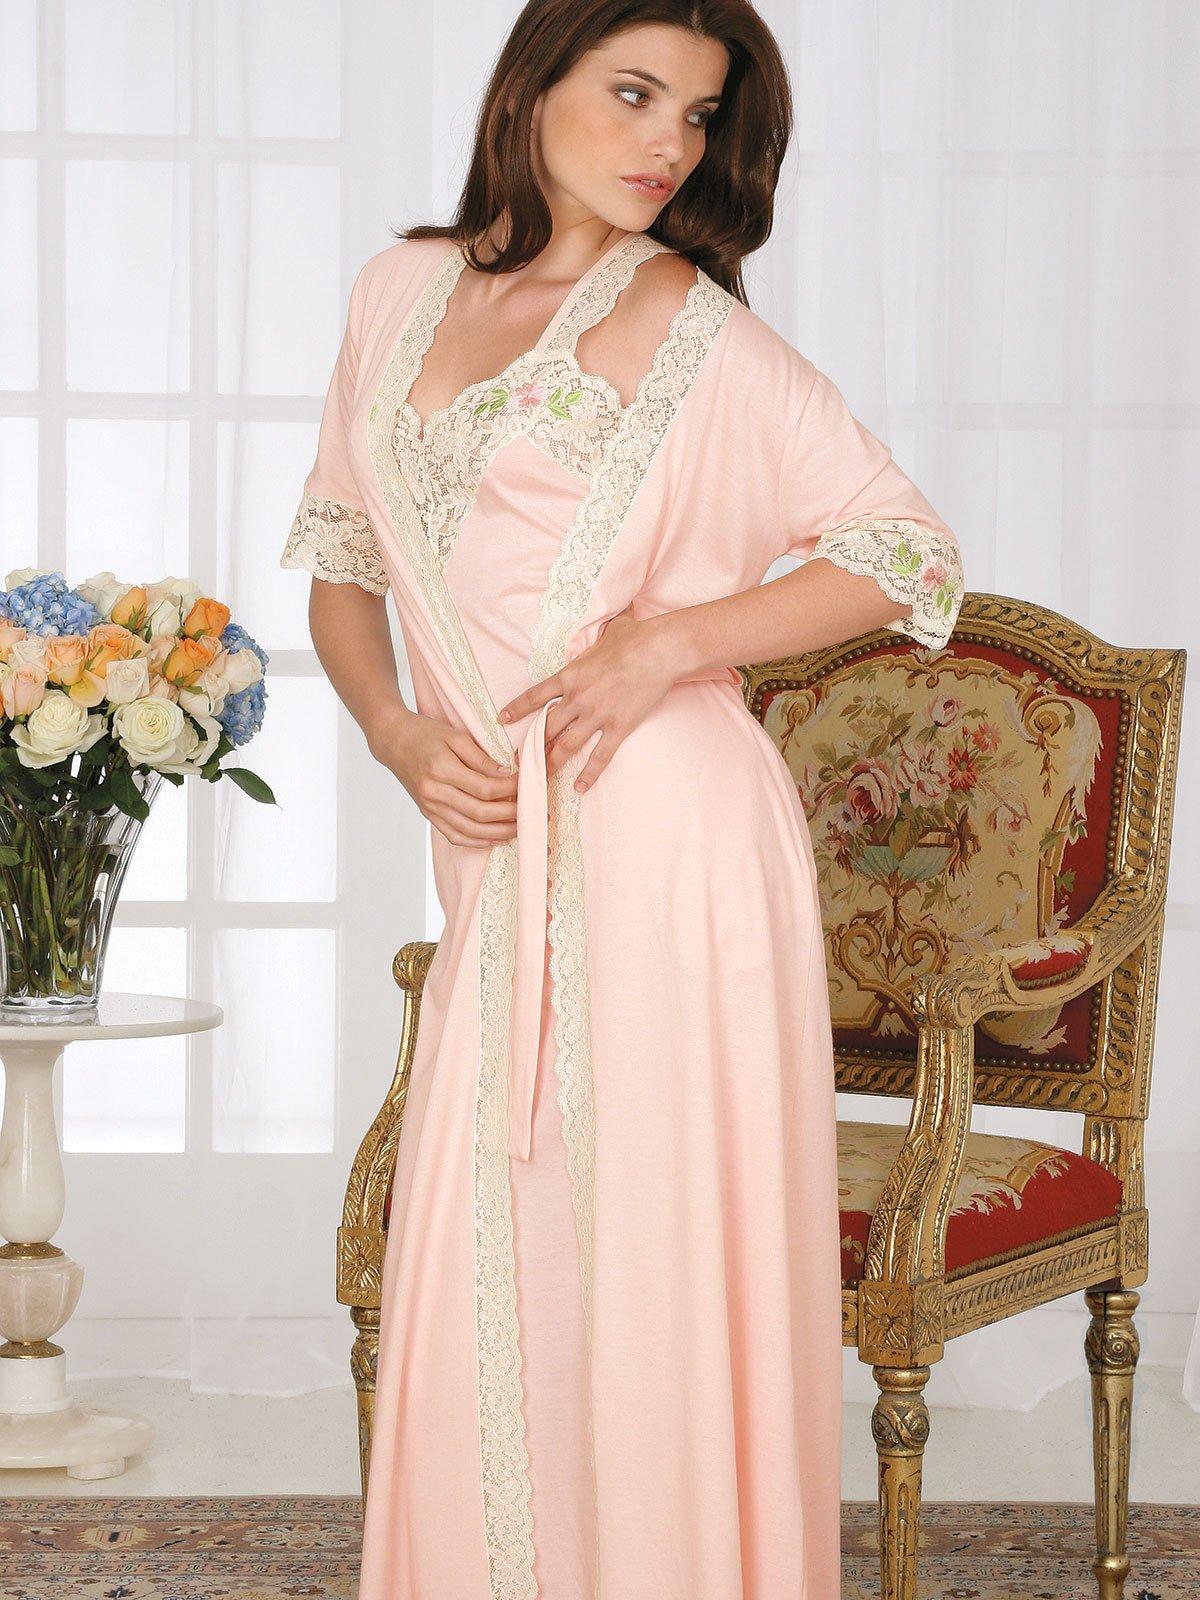 Shana Luxury Nightwear Schweitzer Linen